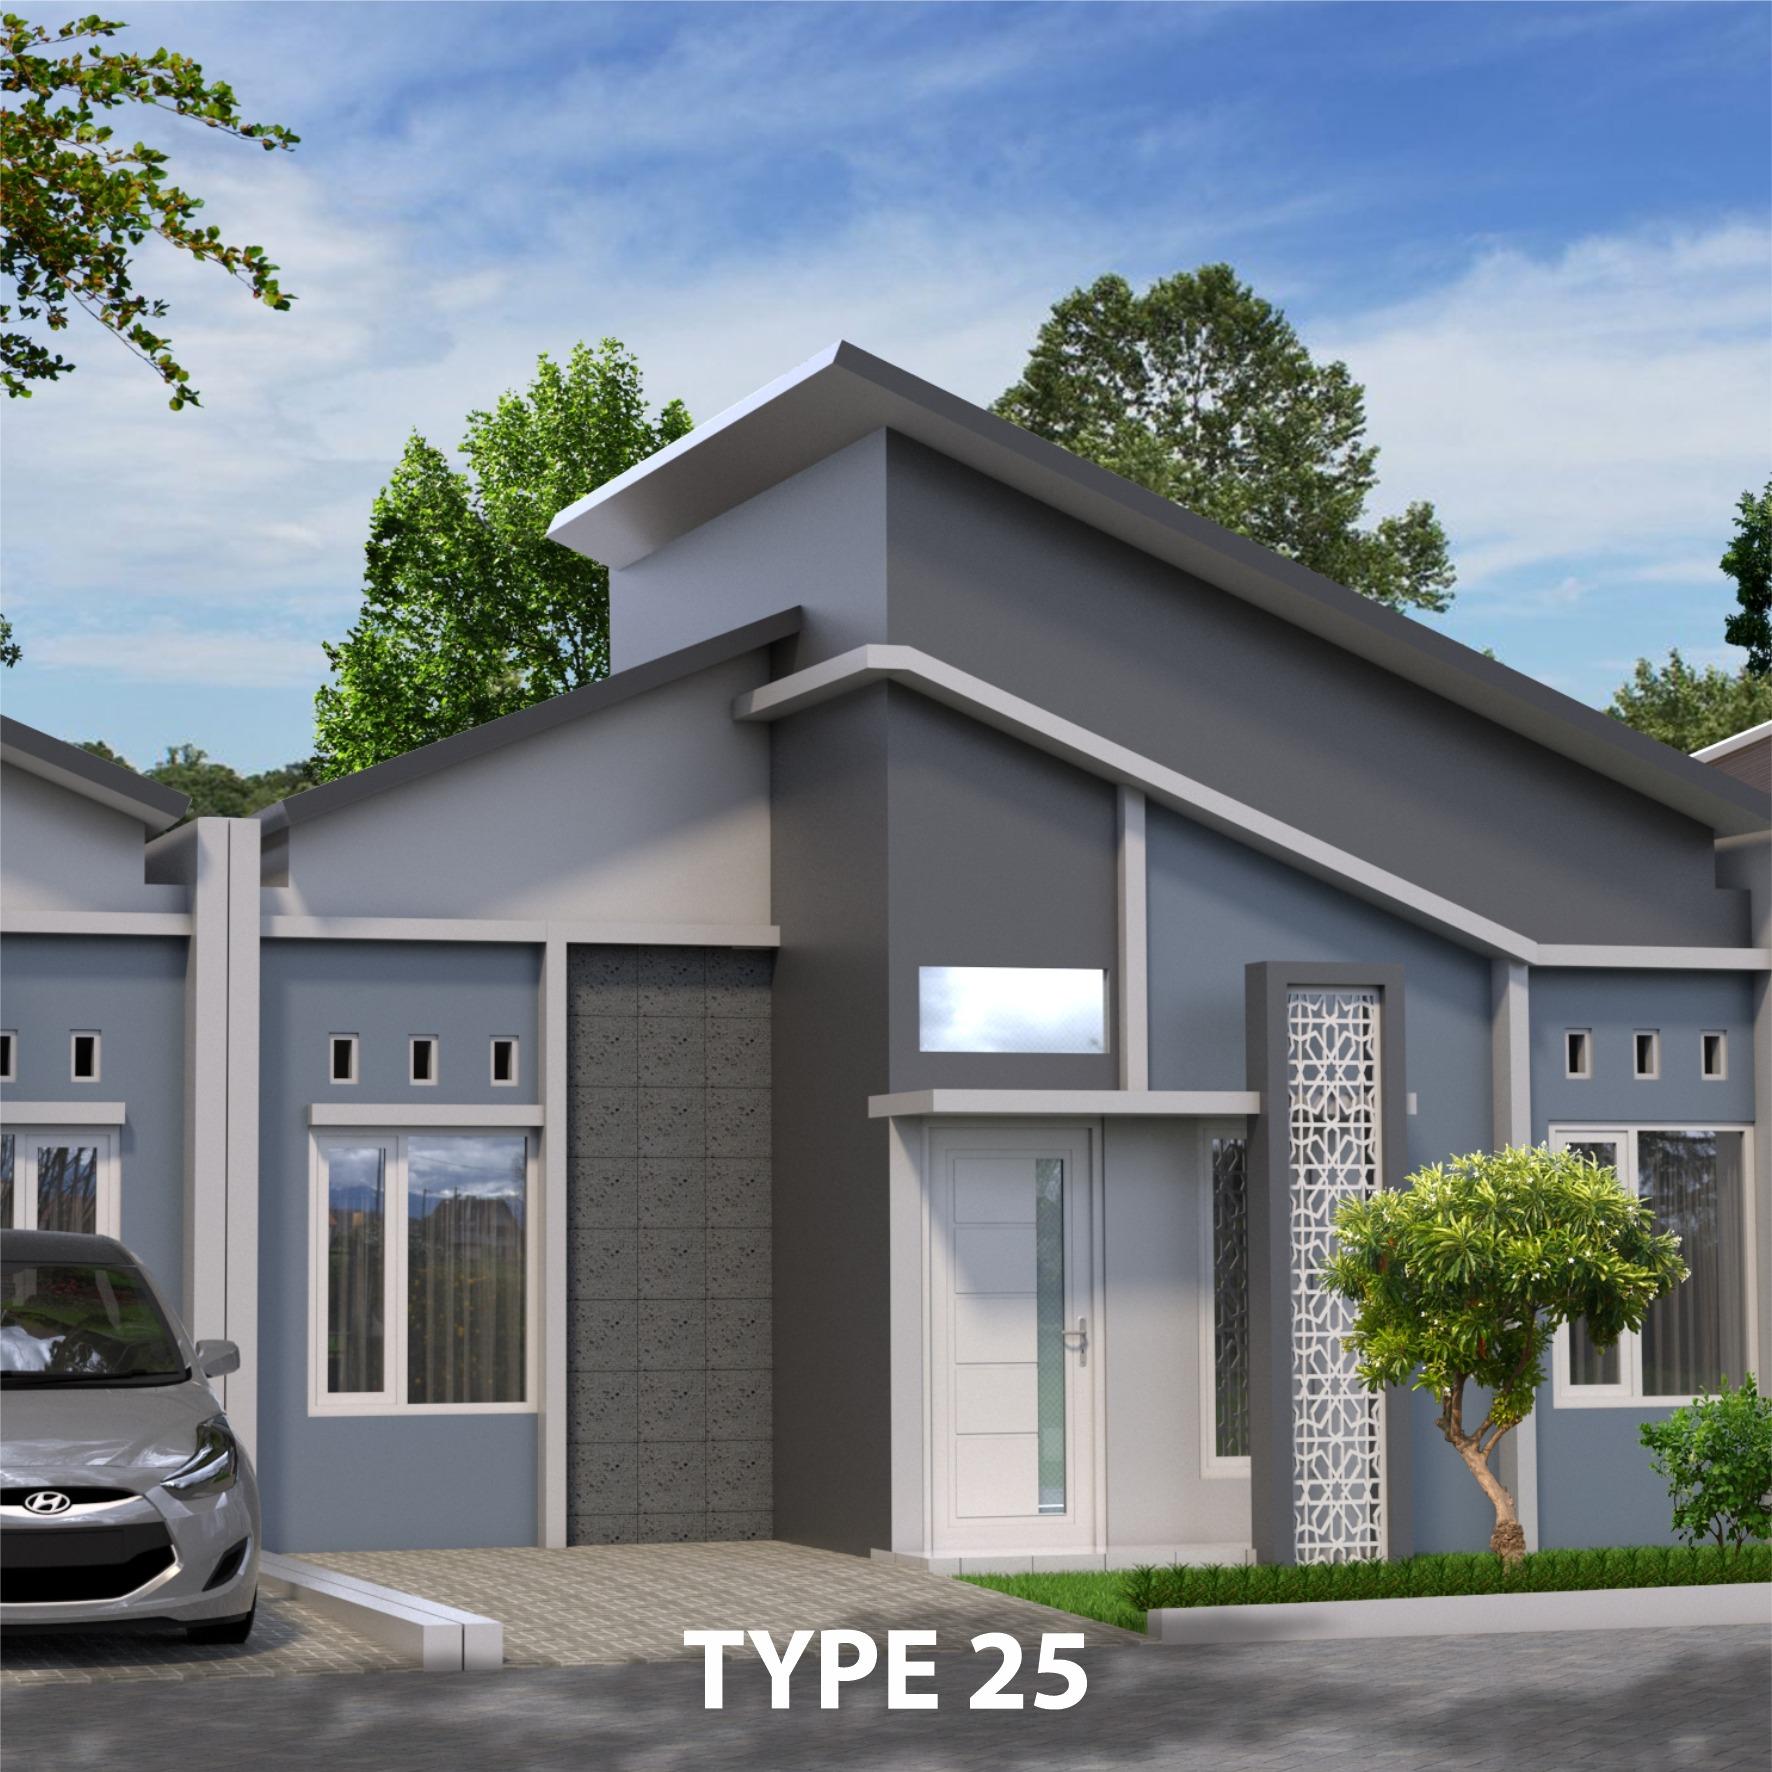 Rumah Murah di Malang Harga di Bawah 200 Juta